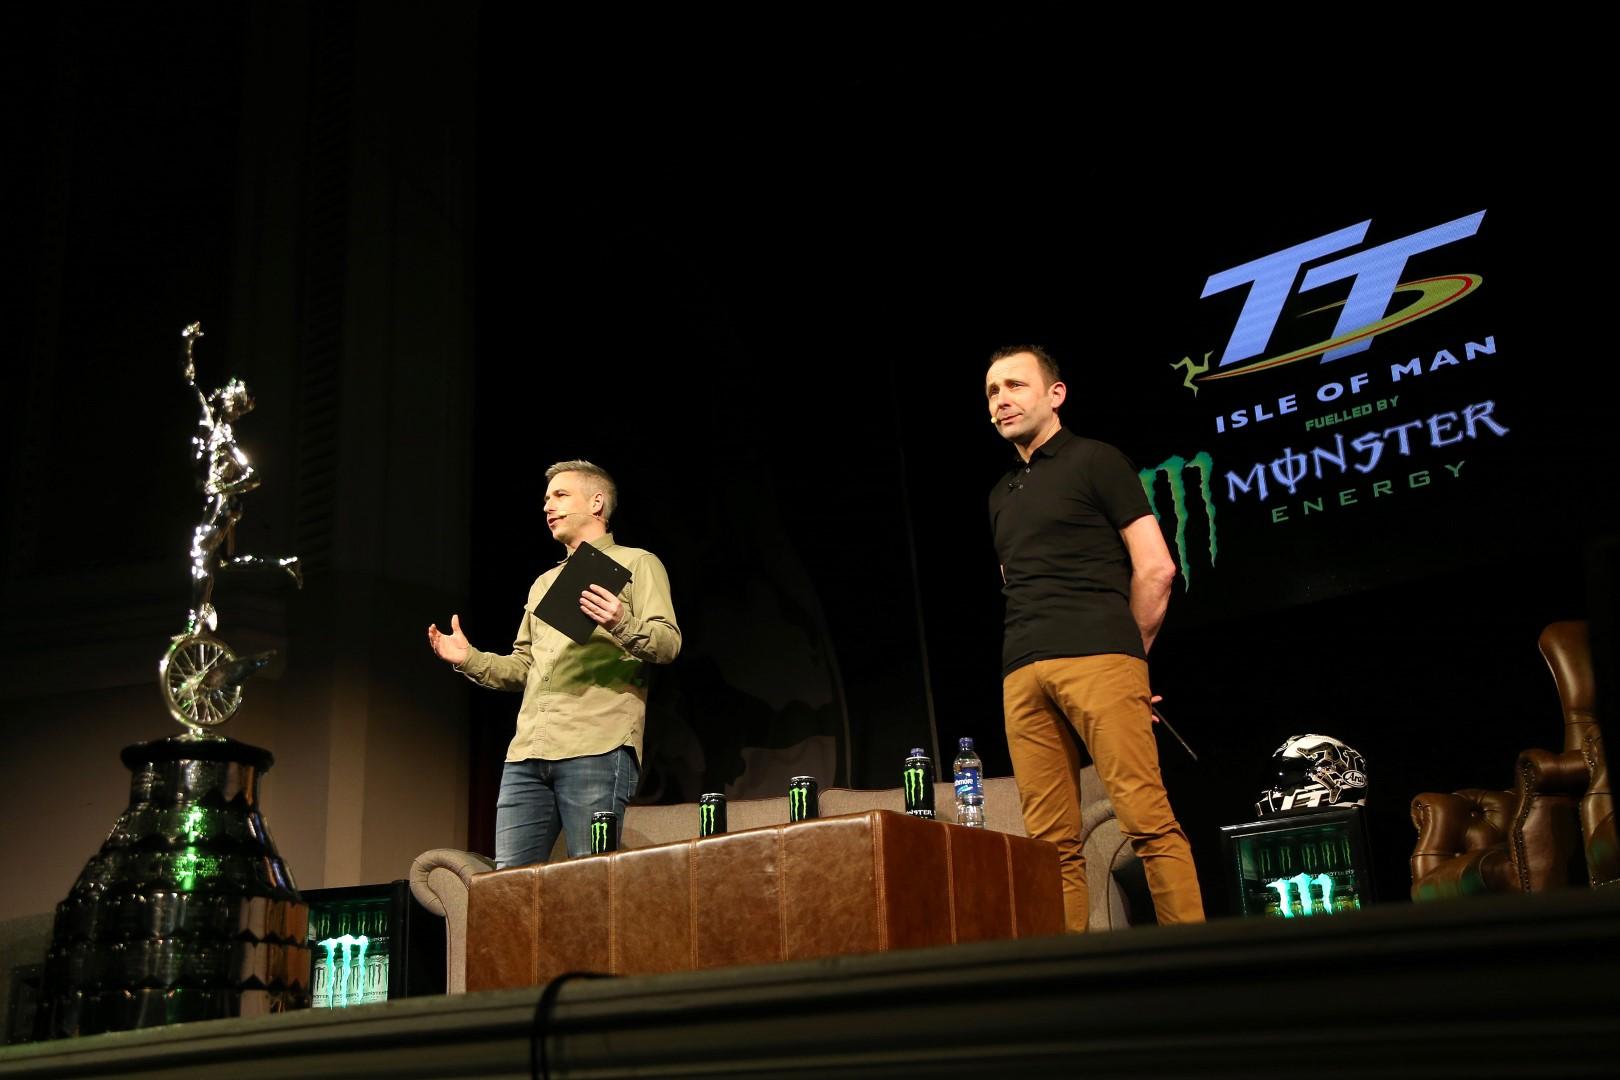 Presentacion Tourist Trophy 2017